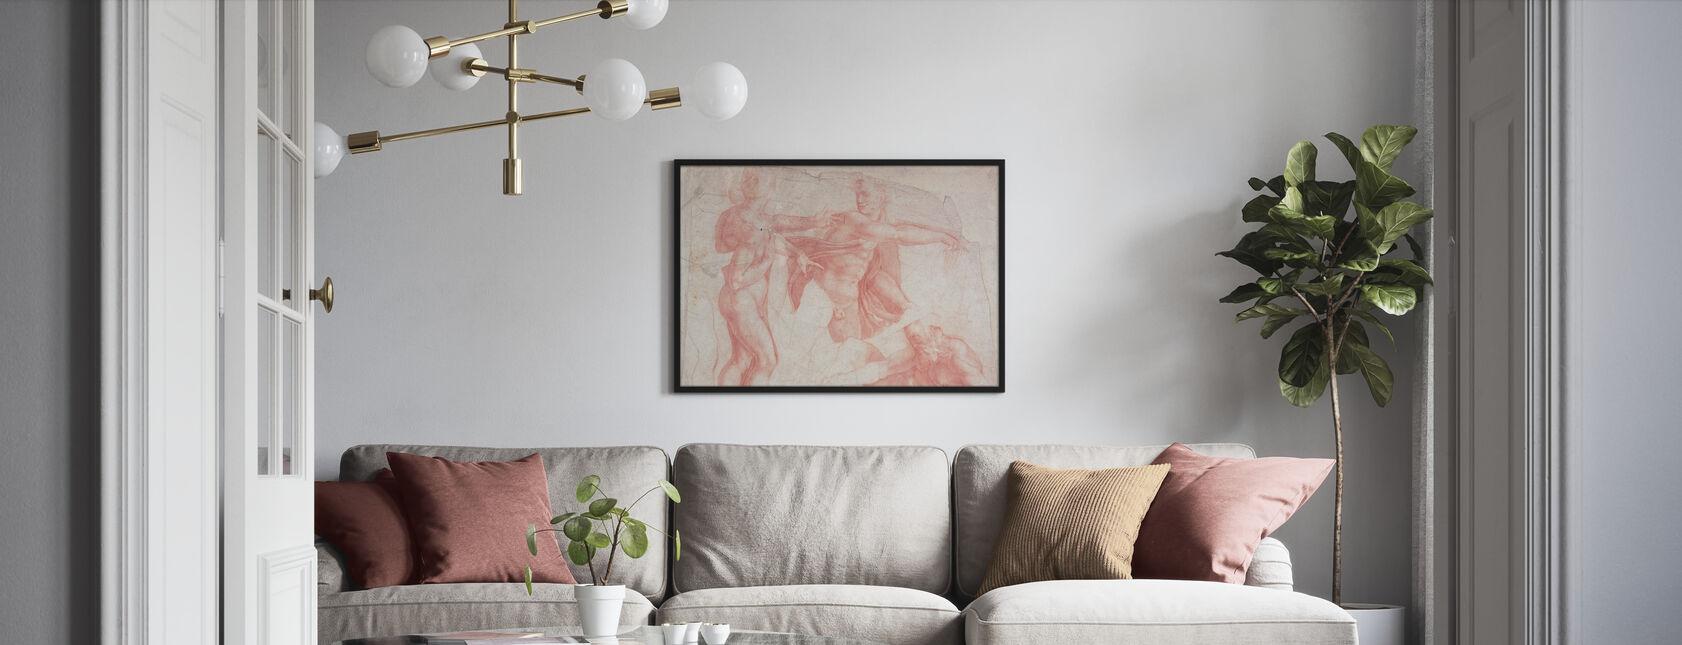 Studies of Male Nudes - Michelangelo Buonarroti - Framed print - Living Room